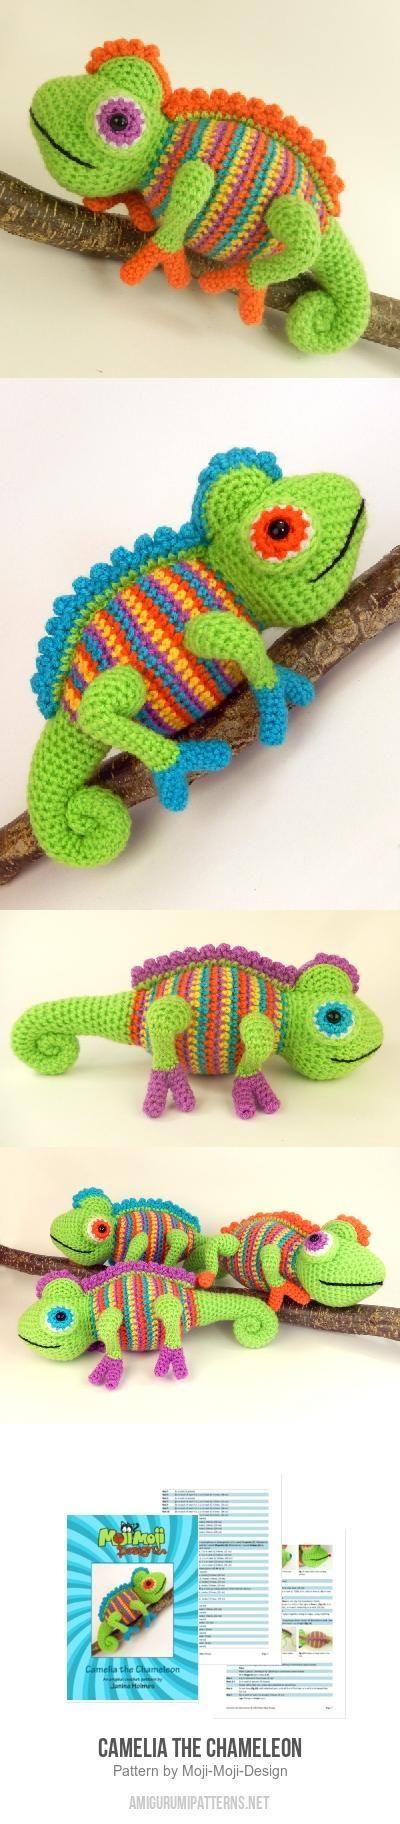 Camelia the Chameleon amigurumi pattern by Janine Holmes at Moji ...